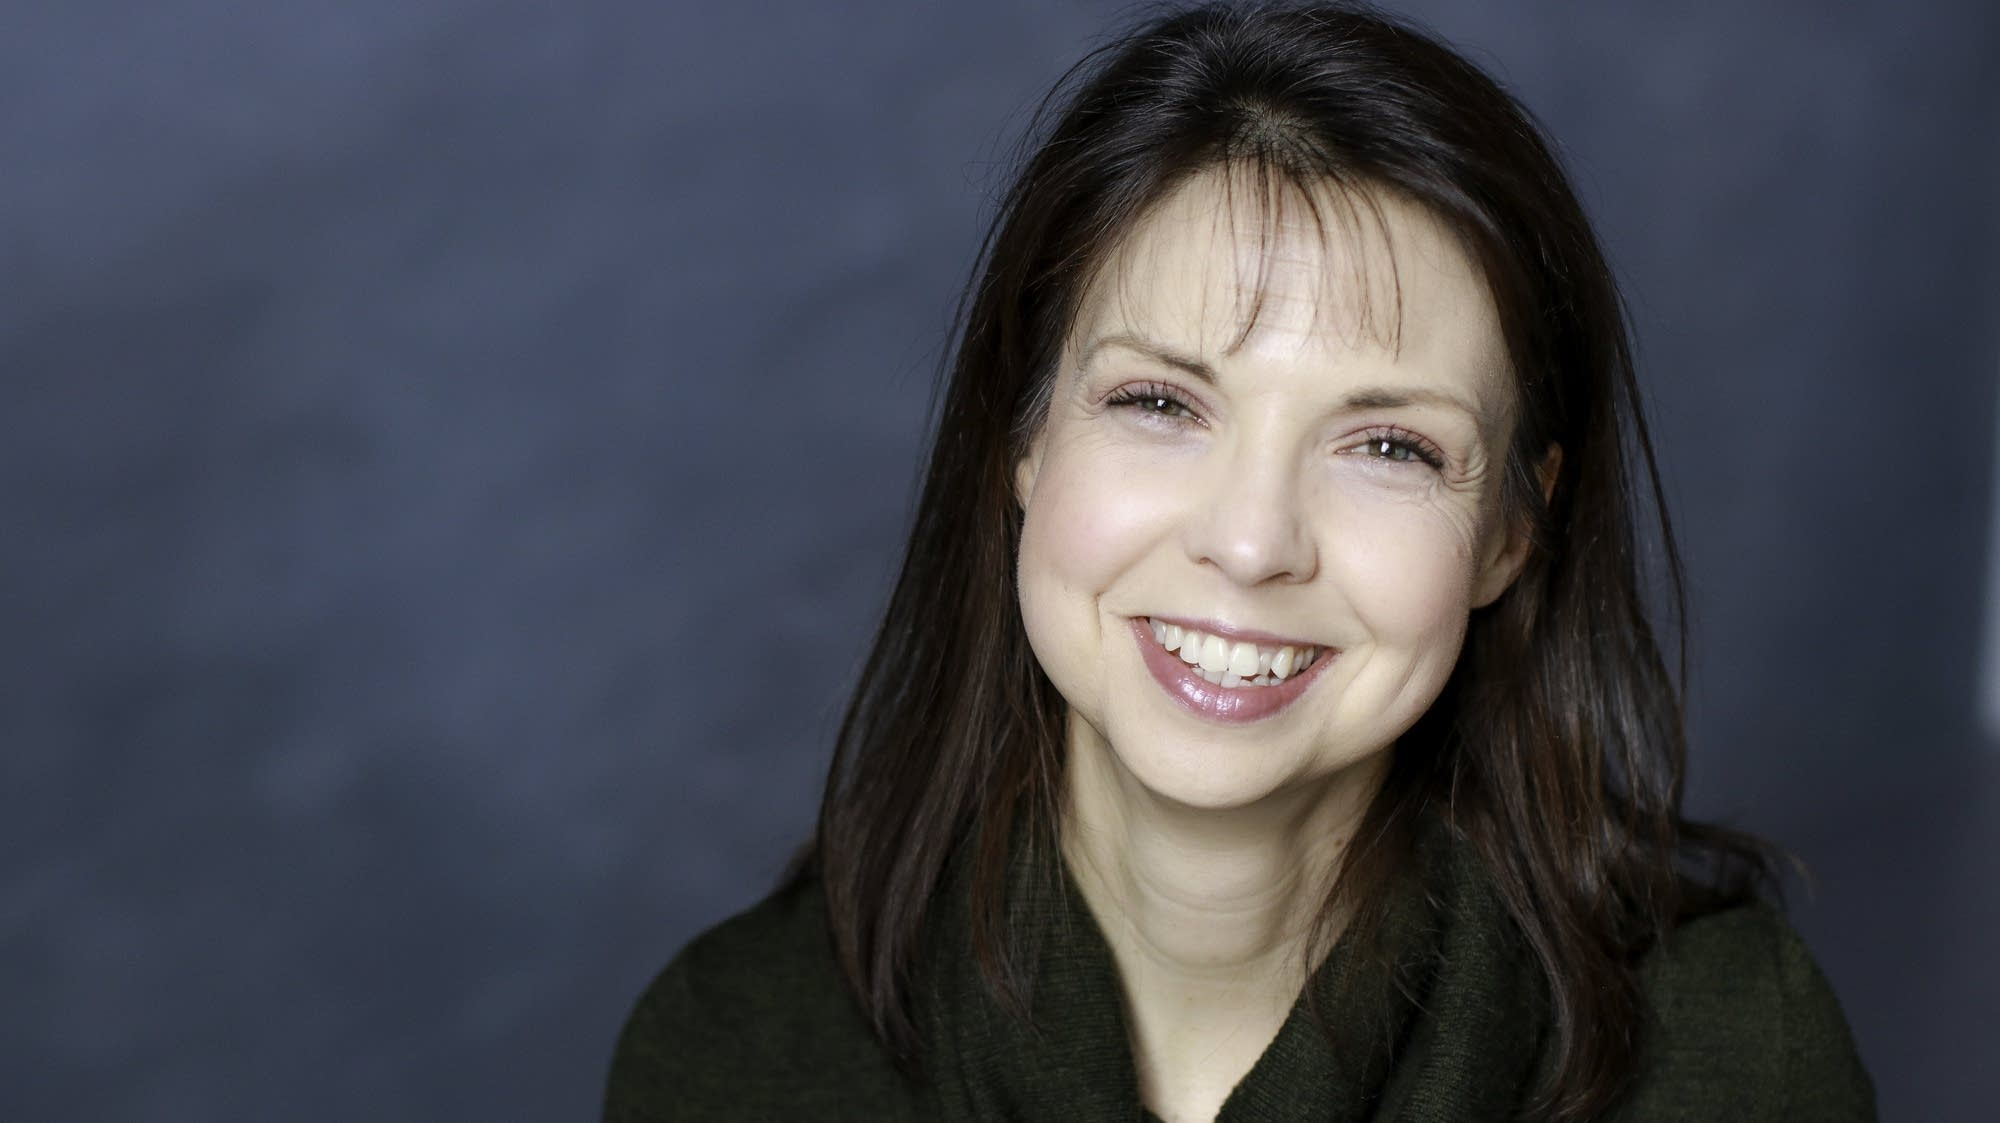 Minnesota-based soprano Andrea Leap